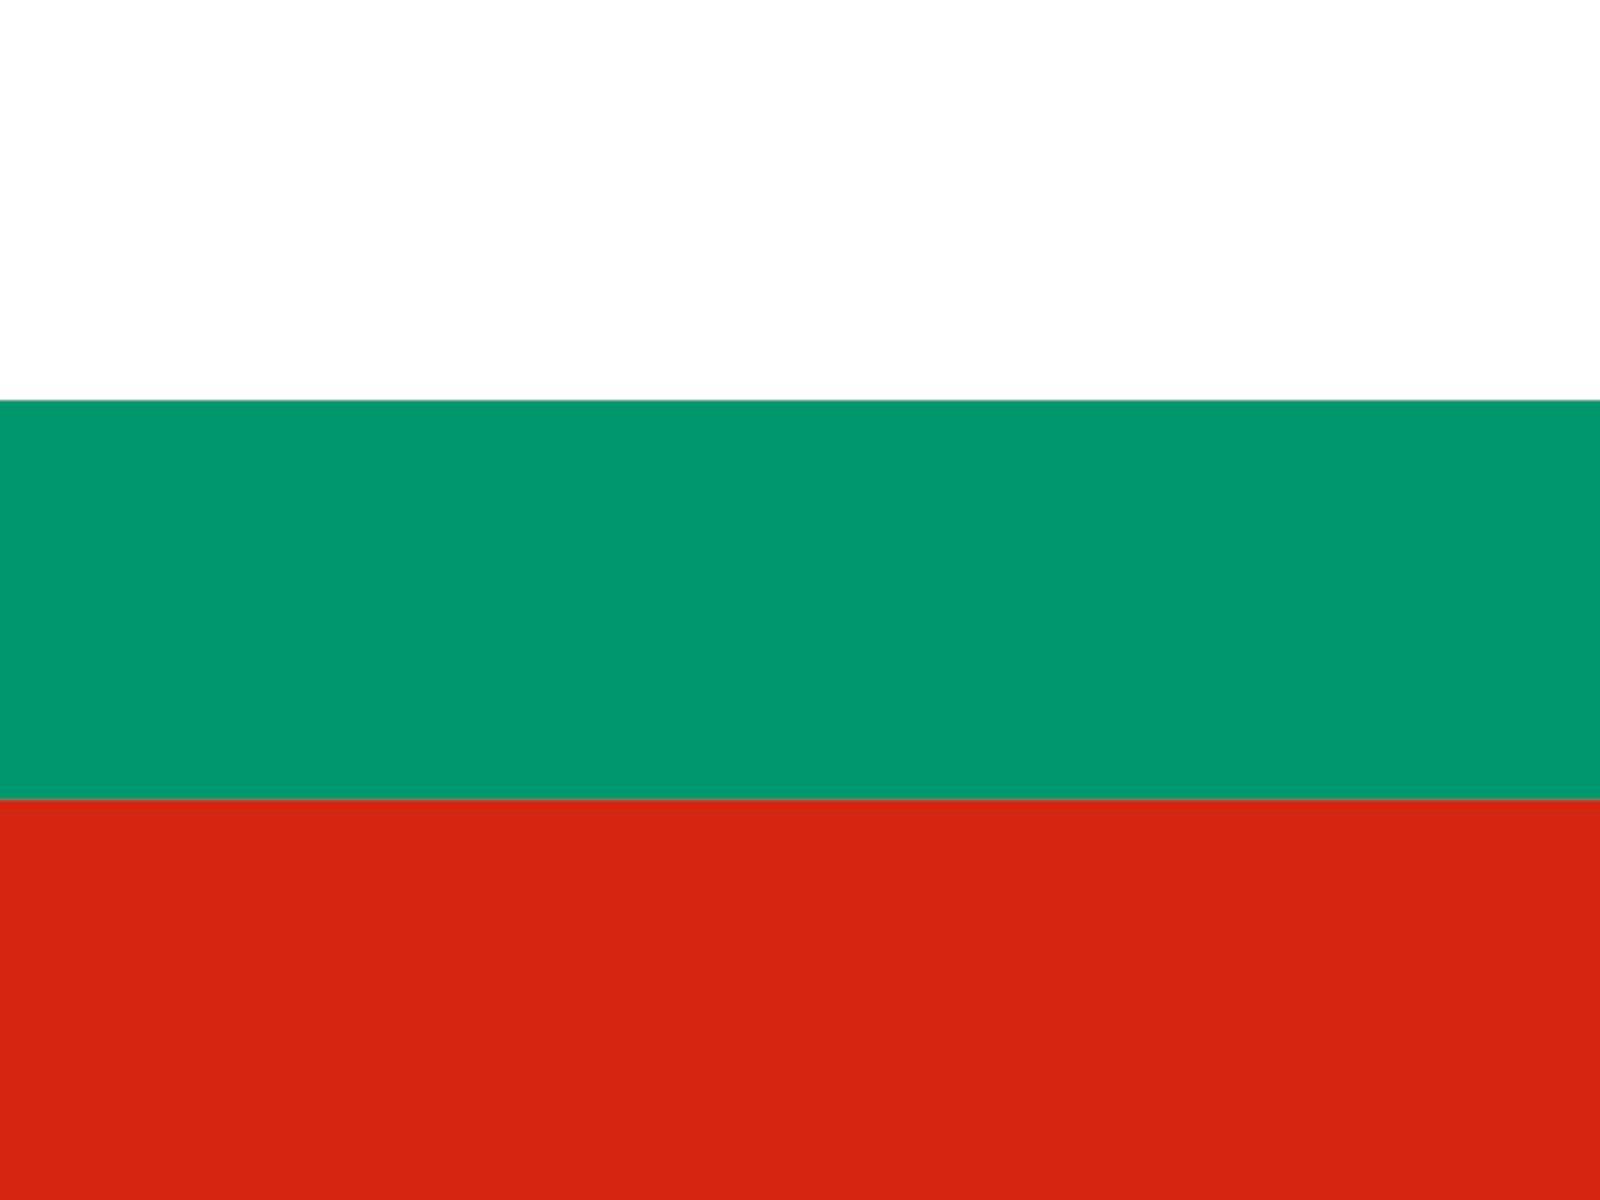 Flagge Bulgariens